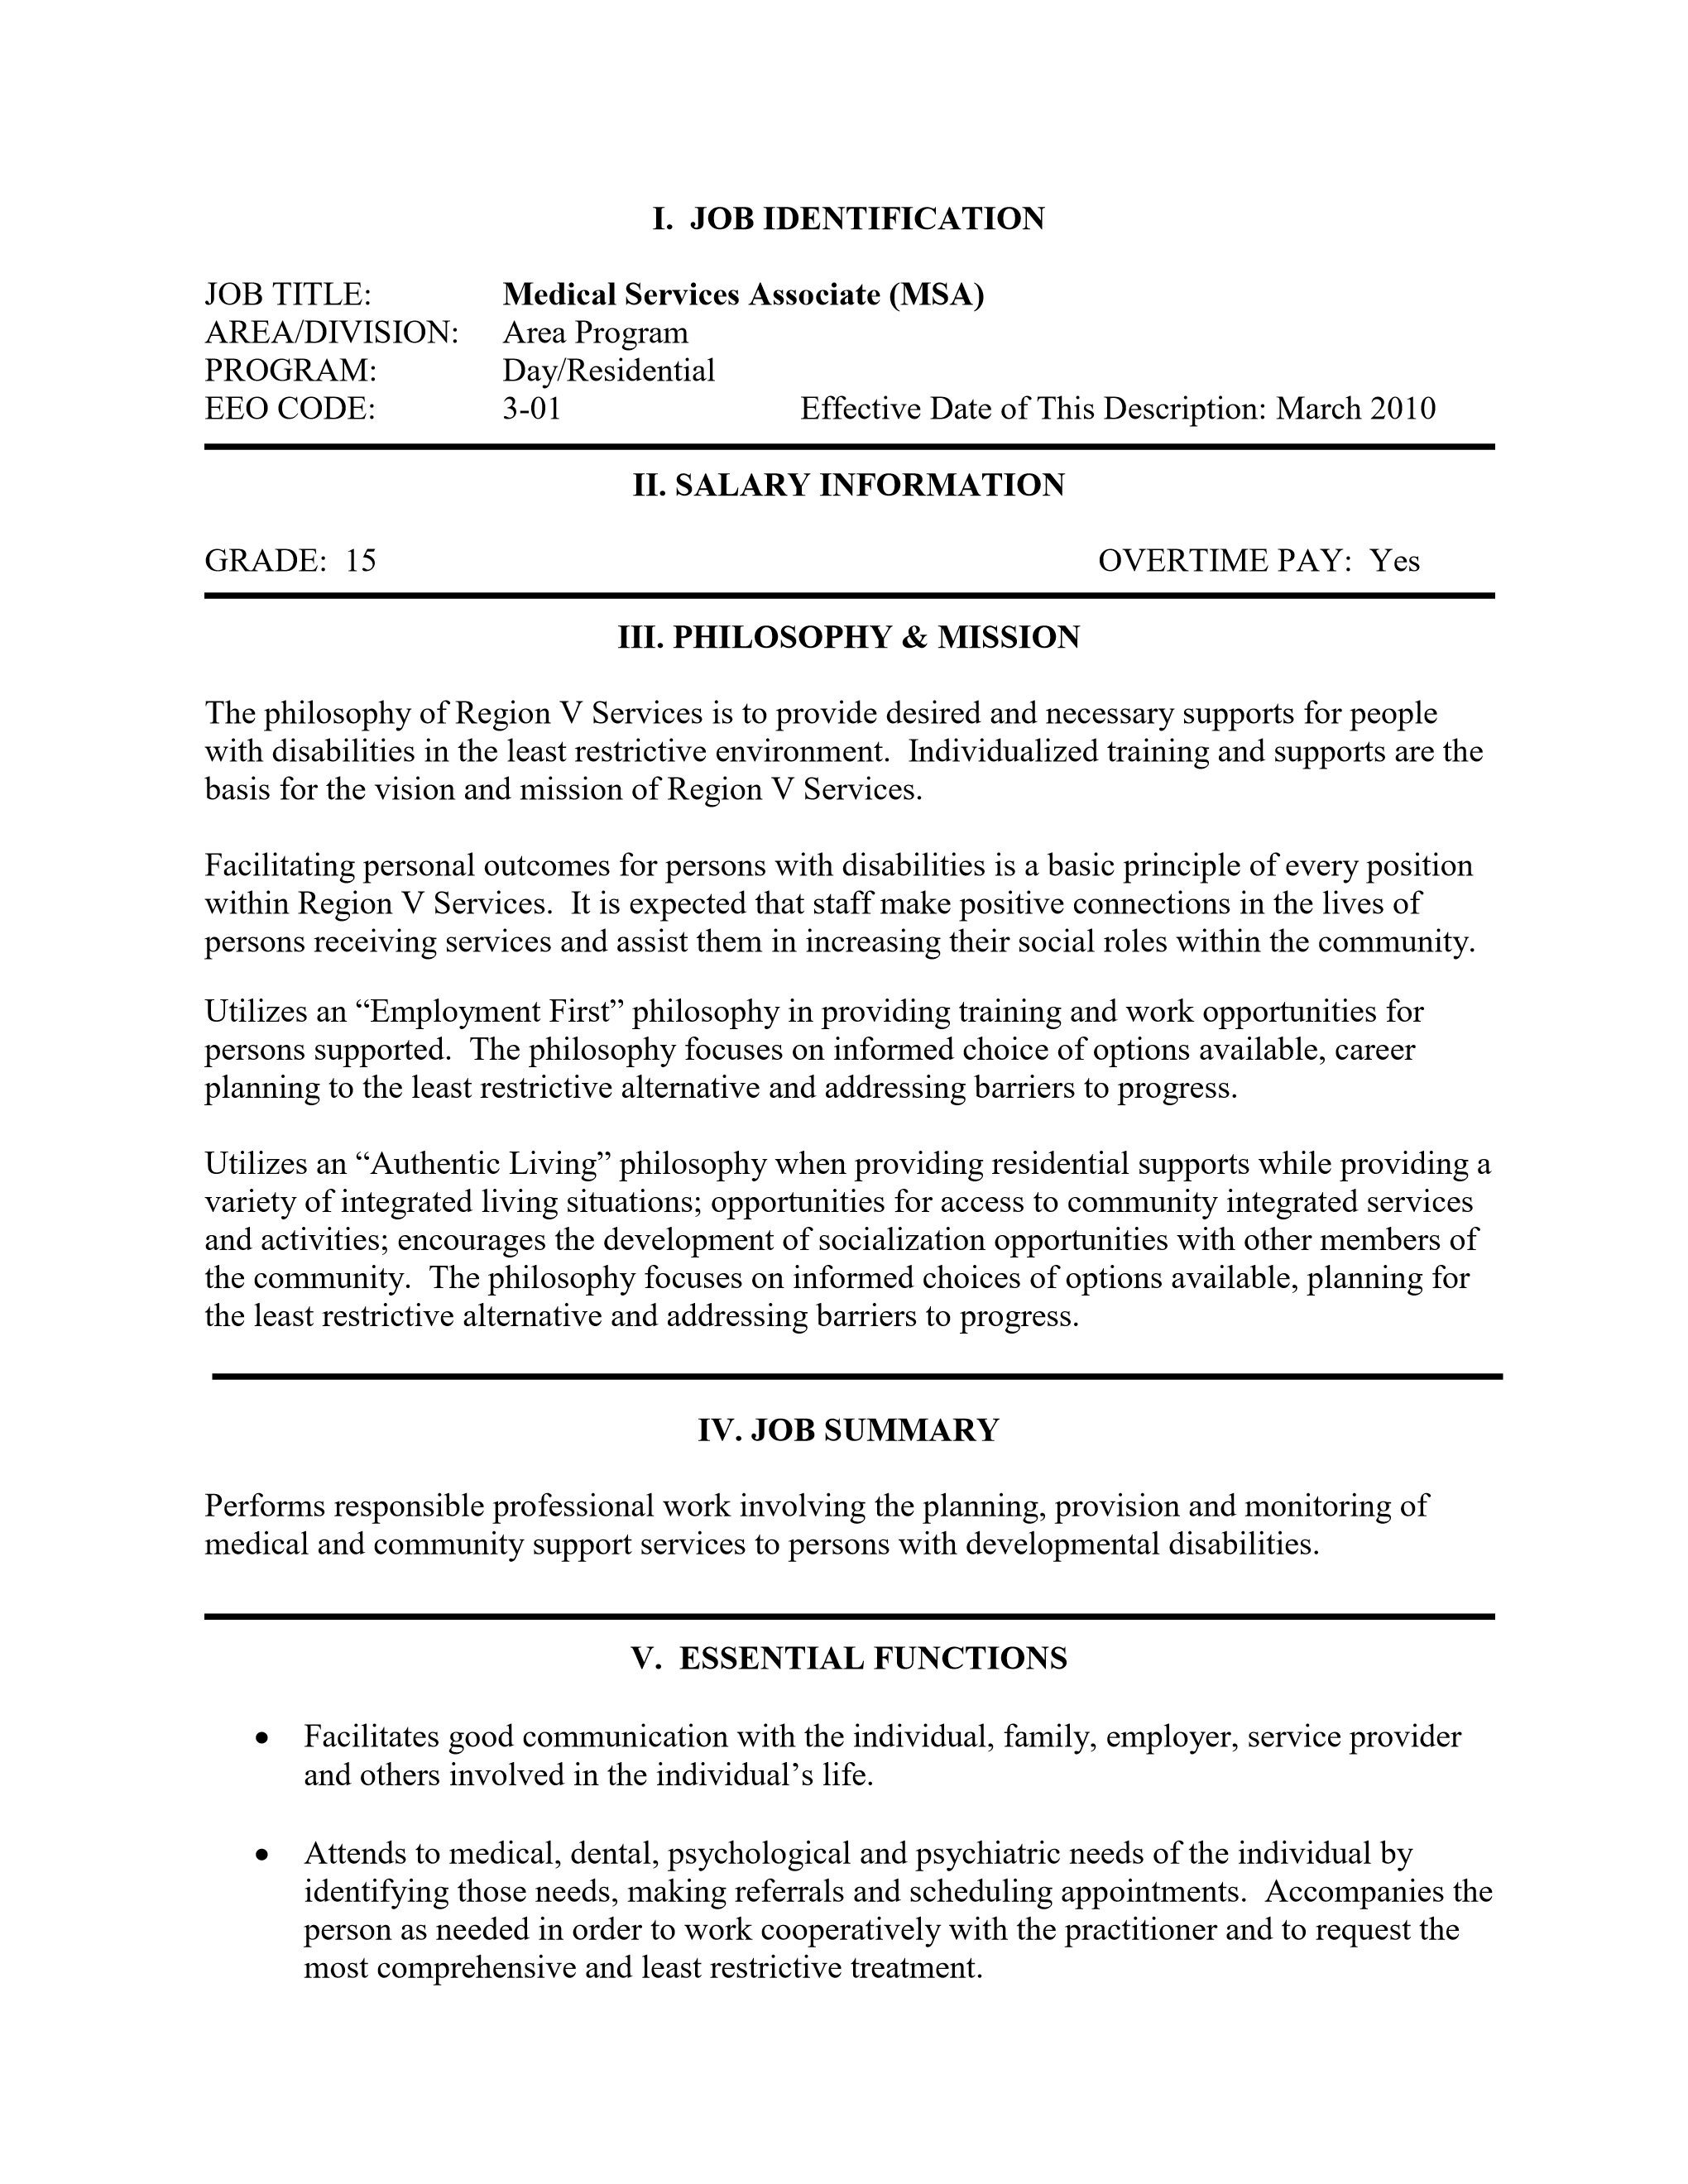 Region V Services : Medical Services Associate (MSA)